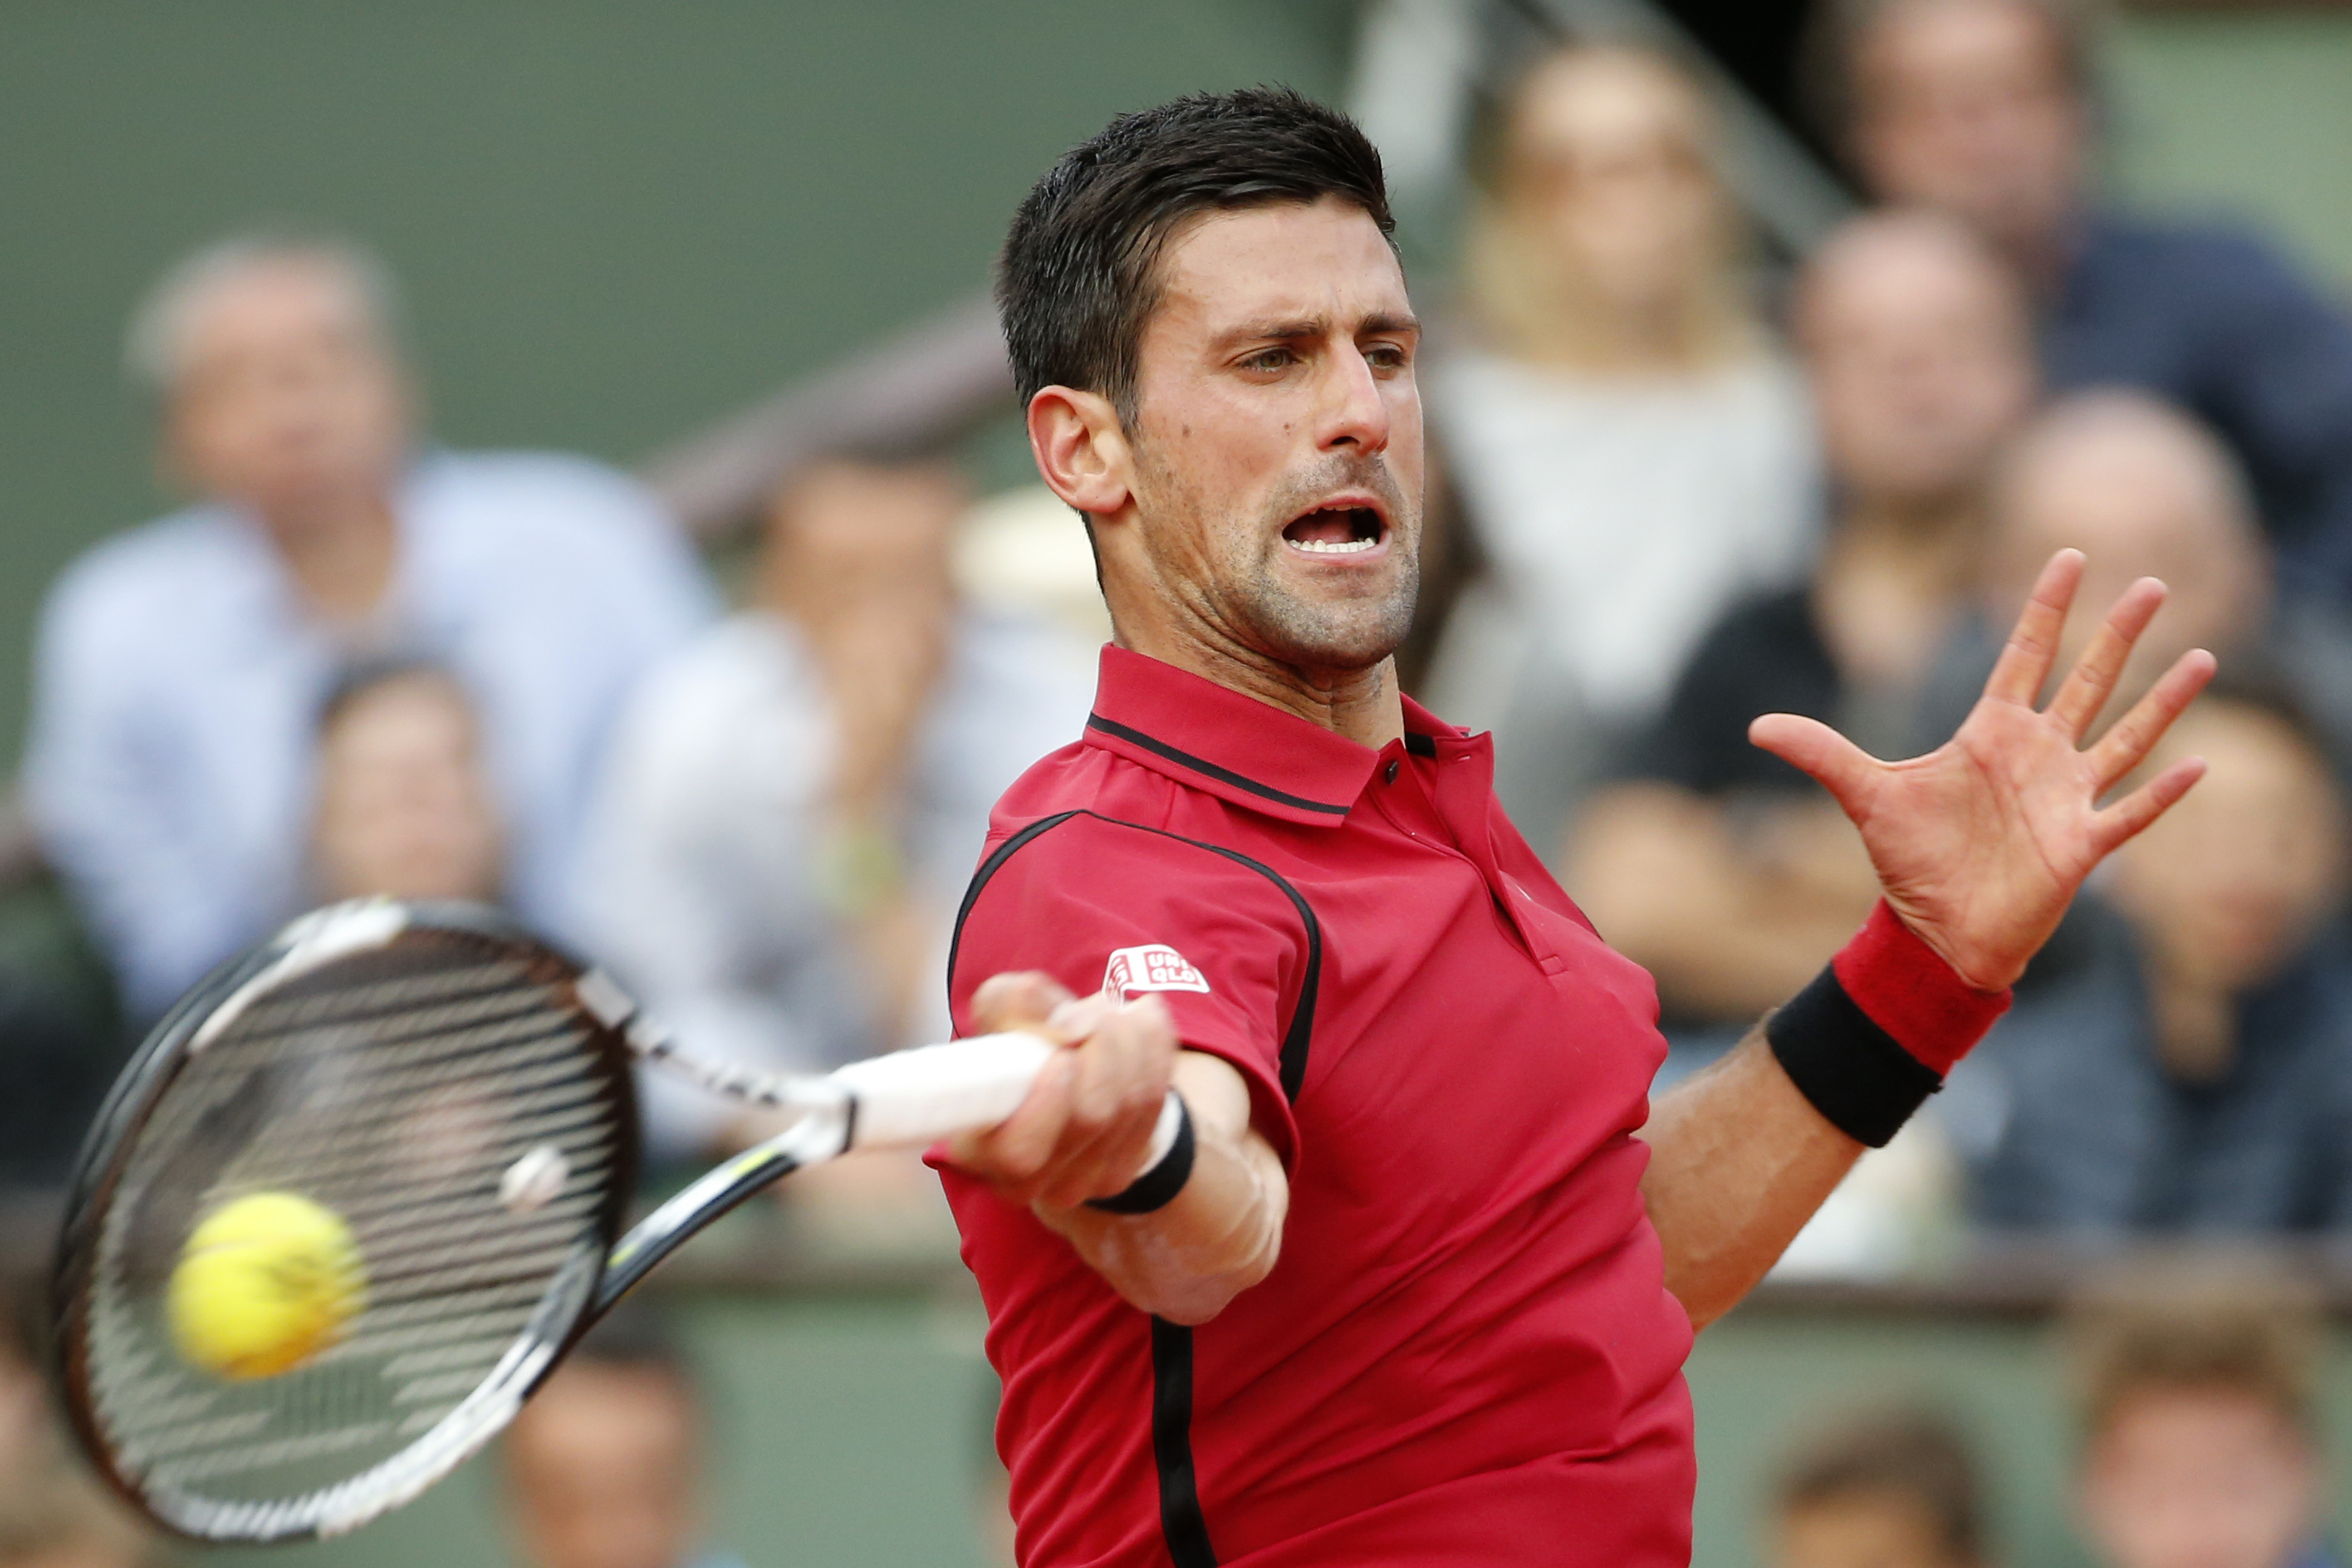 Serbia's Novak Djokovic returns in the third round match of the French Open tennis tournament against Britains Aljaz Bedene at the Roland Garros stadium in Paris, France, Saturday, May 28, 2016. (AP Photo/Alastair Grant)